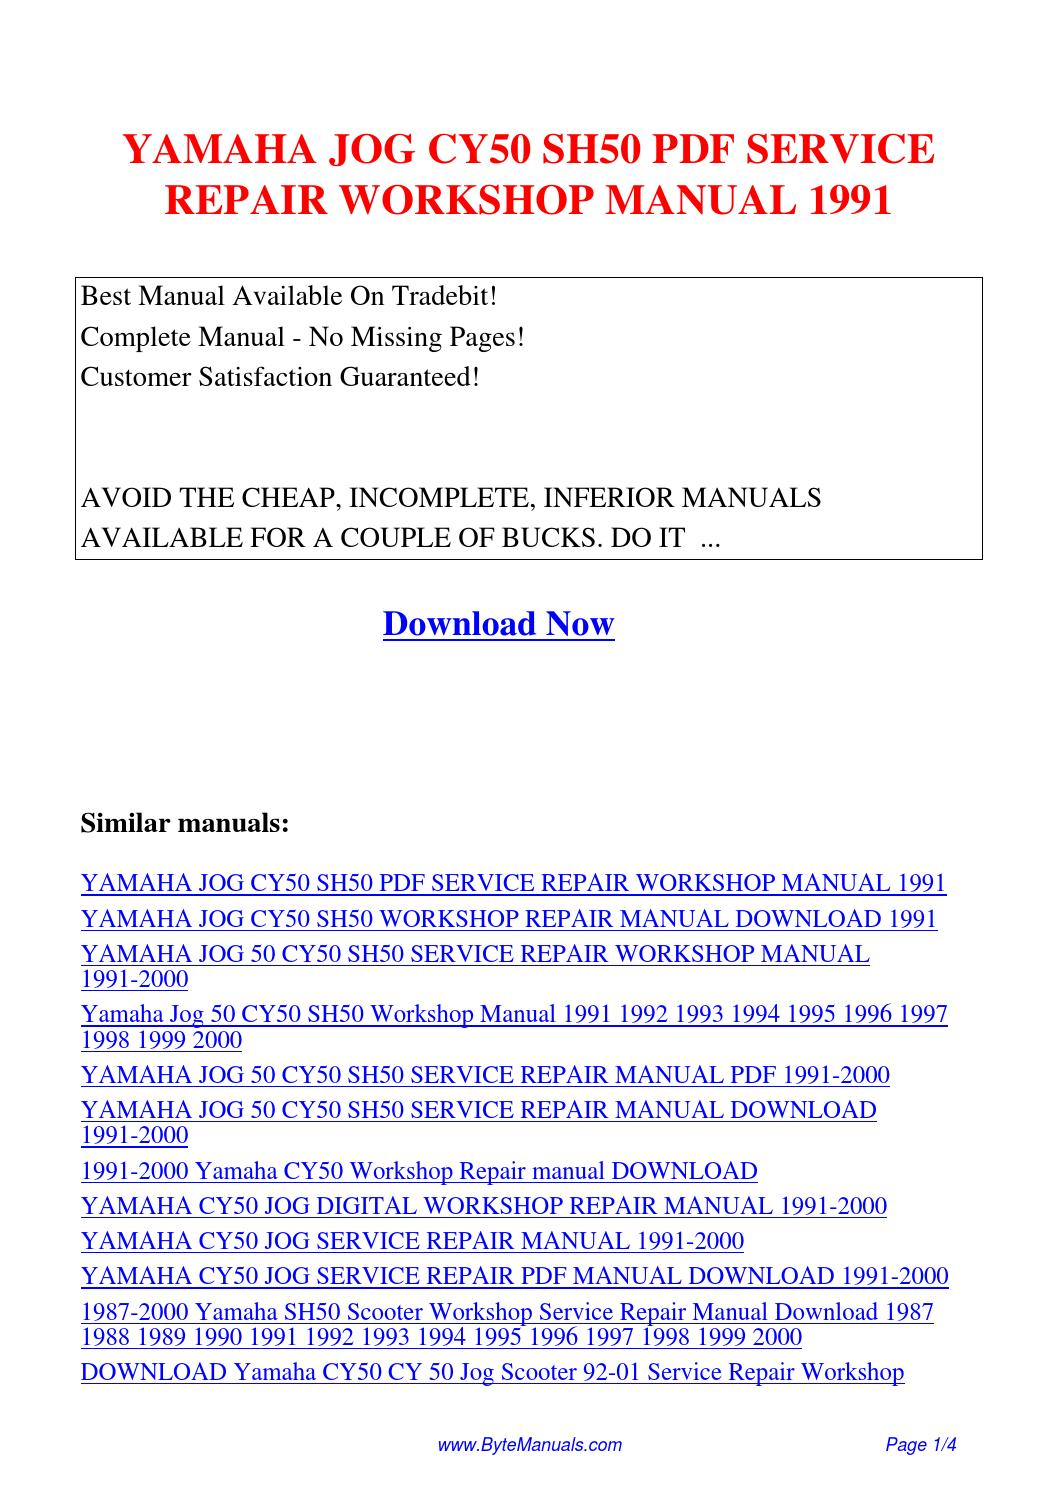 YAMAHA JOG CY50 SH50 SERVICE REPAIR WORKSHOP MANUAL 1991.pdf by Ging Tang -  issuu